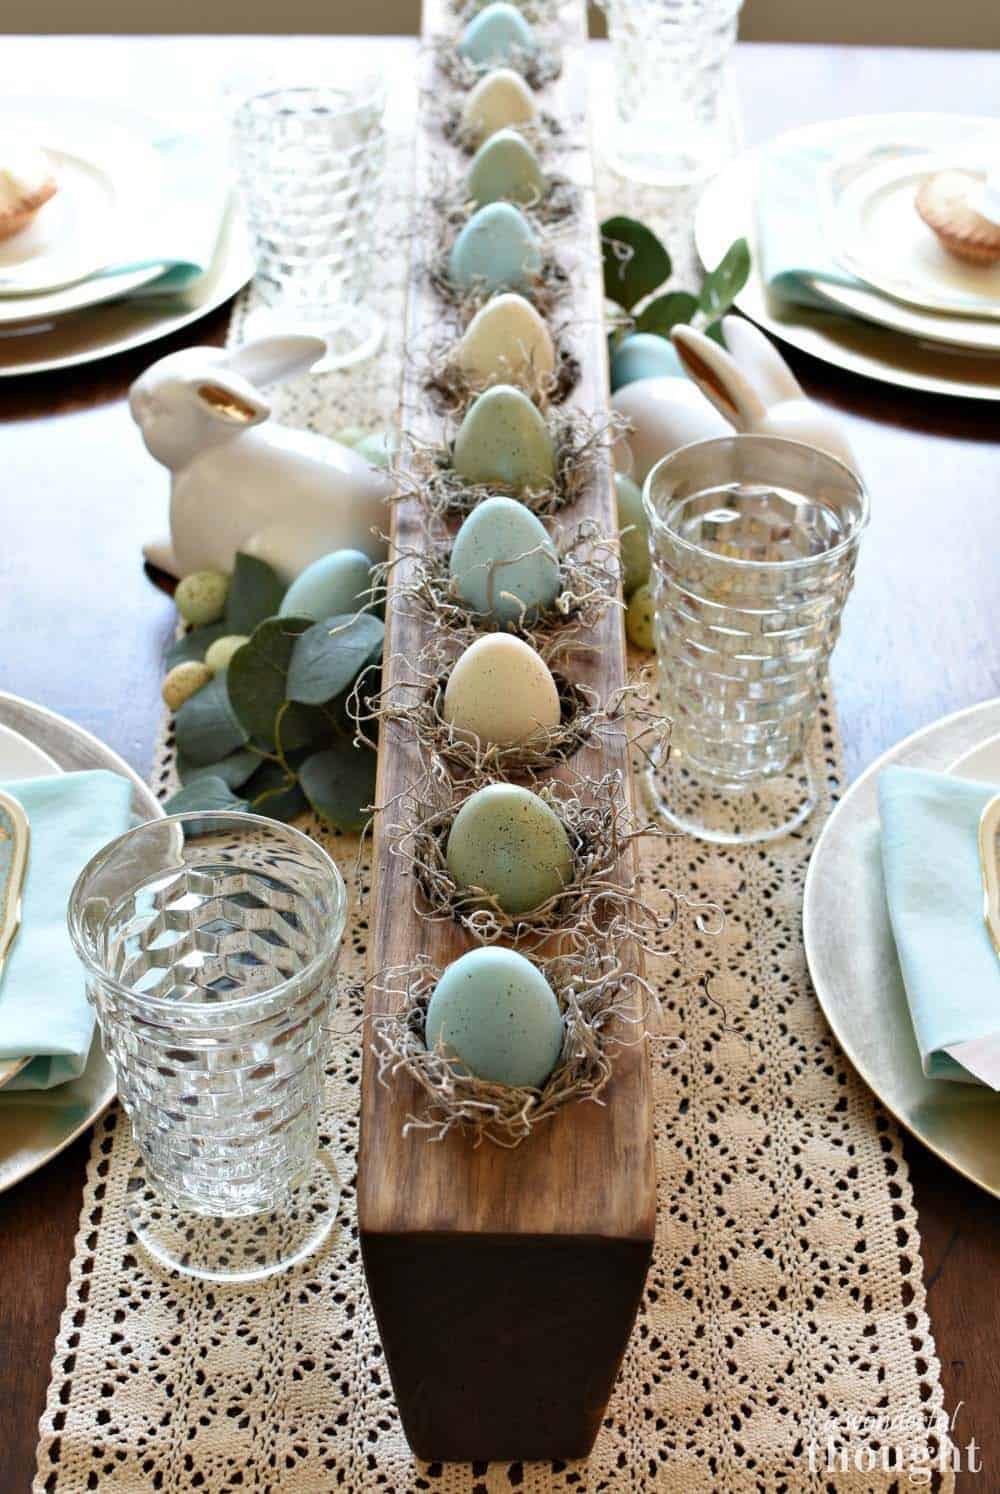 Inspiring Easter Table Centerpiece Ideas